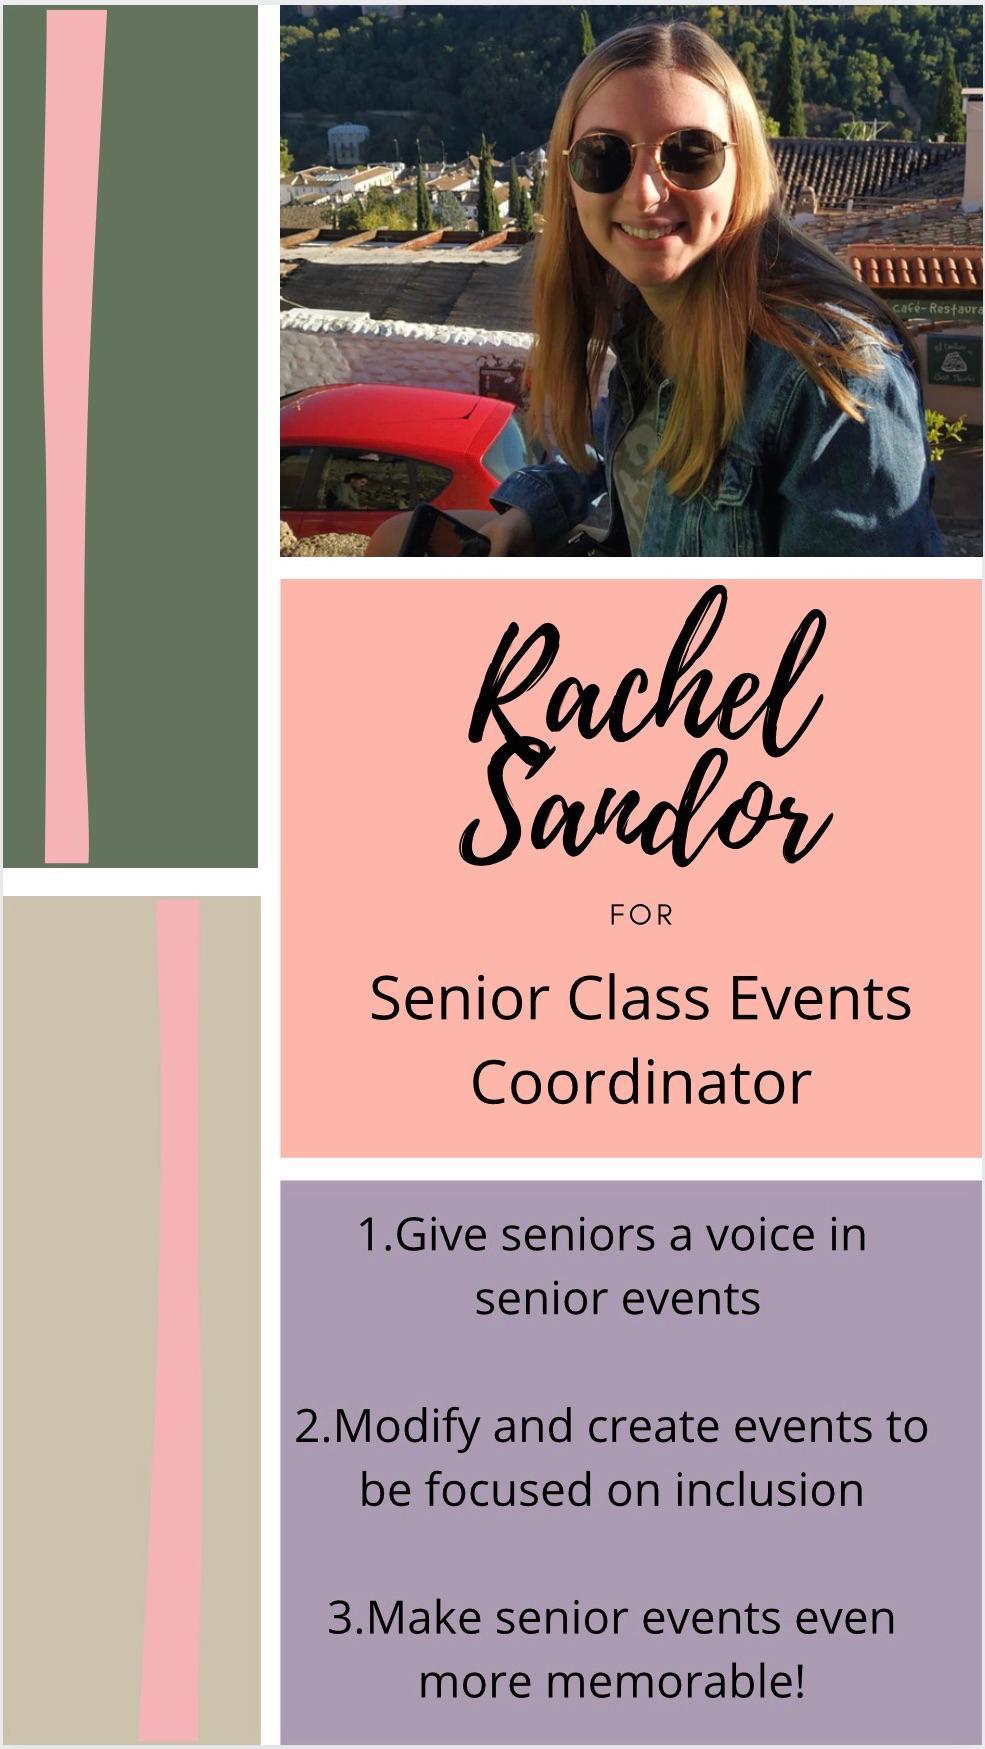 Rachel%20Sandor%20for%20Senior%20Class%20Events%20Coordinator